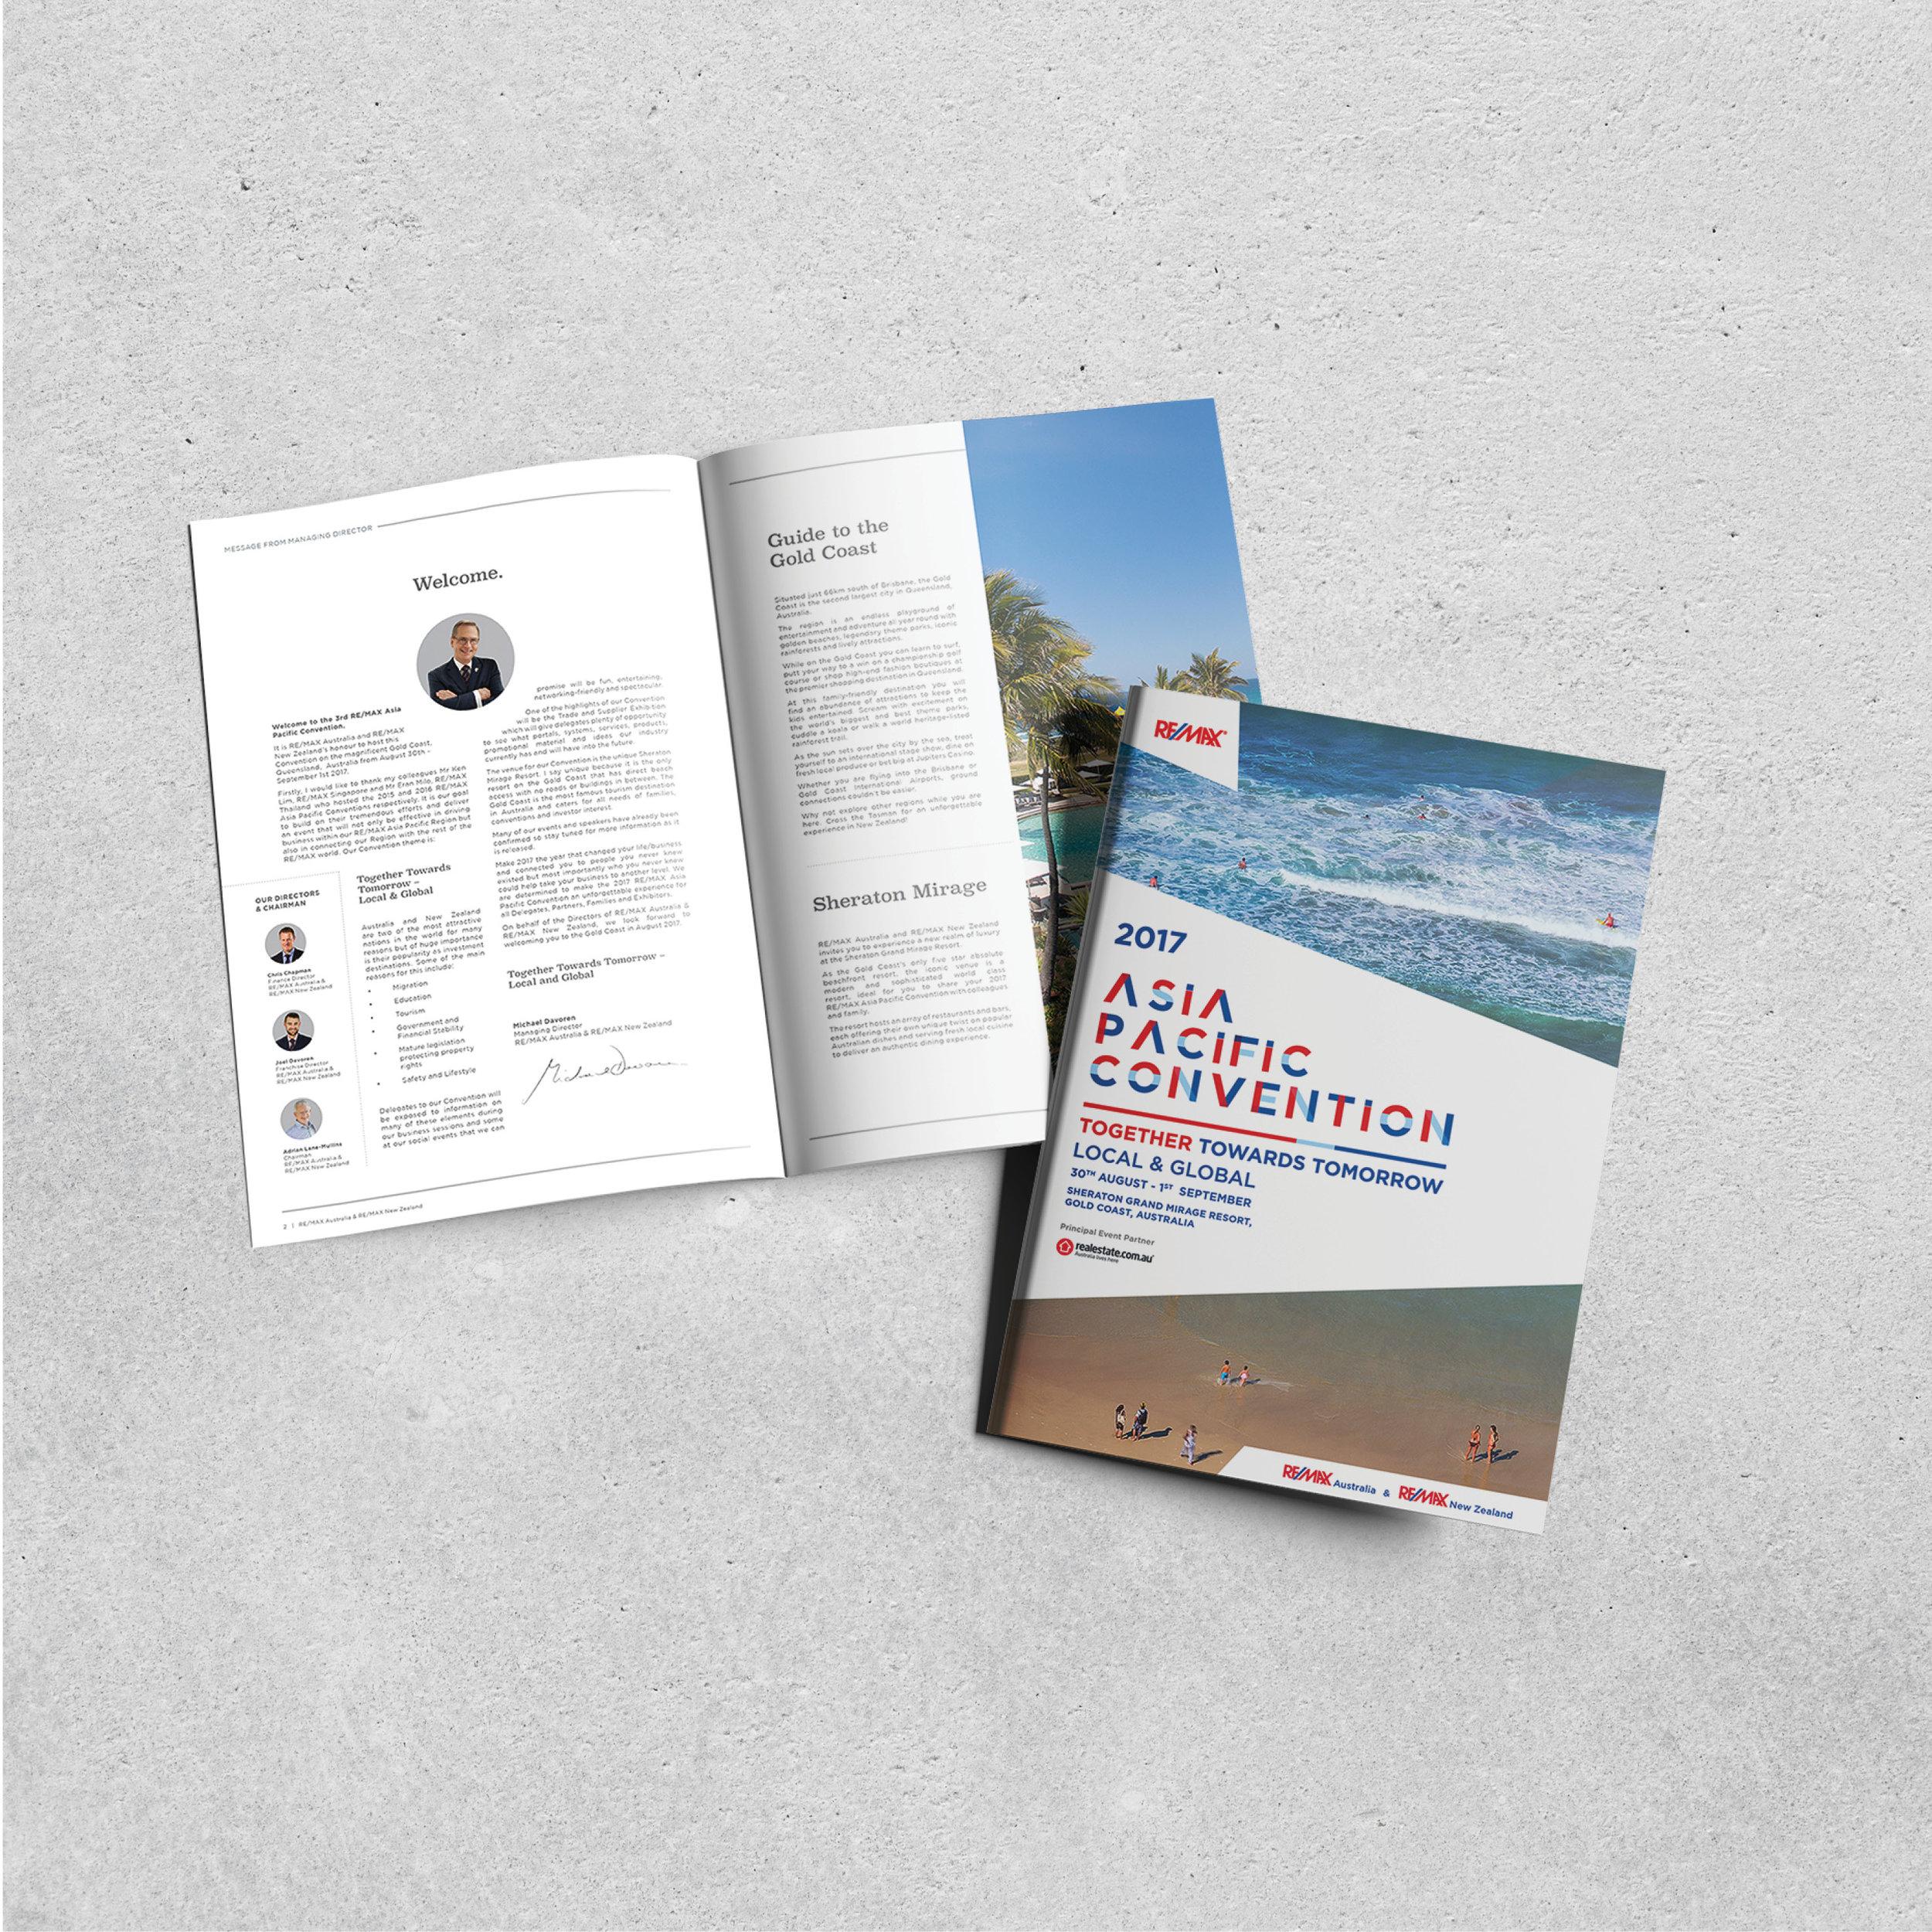 APCagenda-coverinteriorpages.jpg